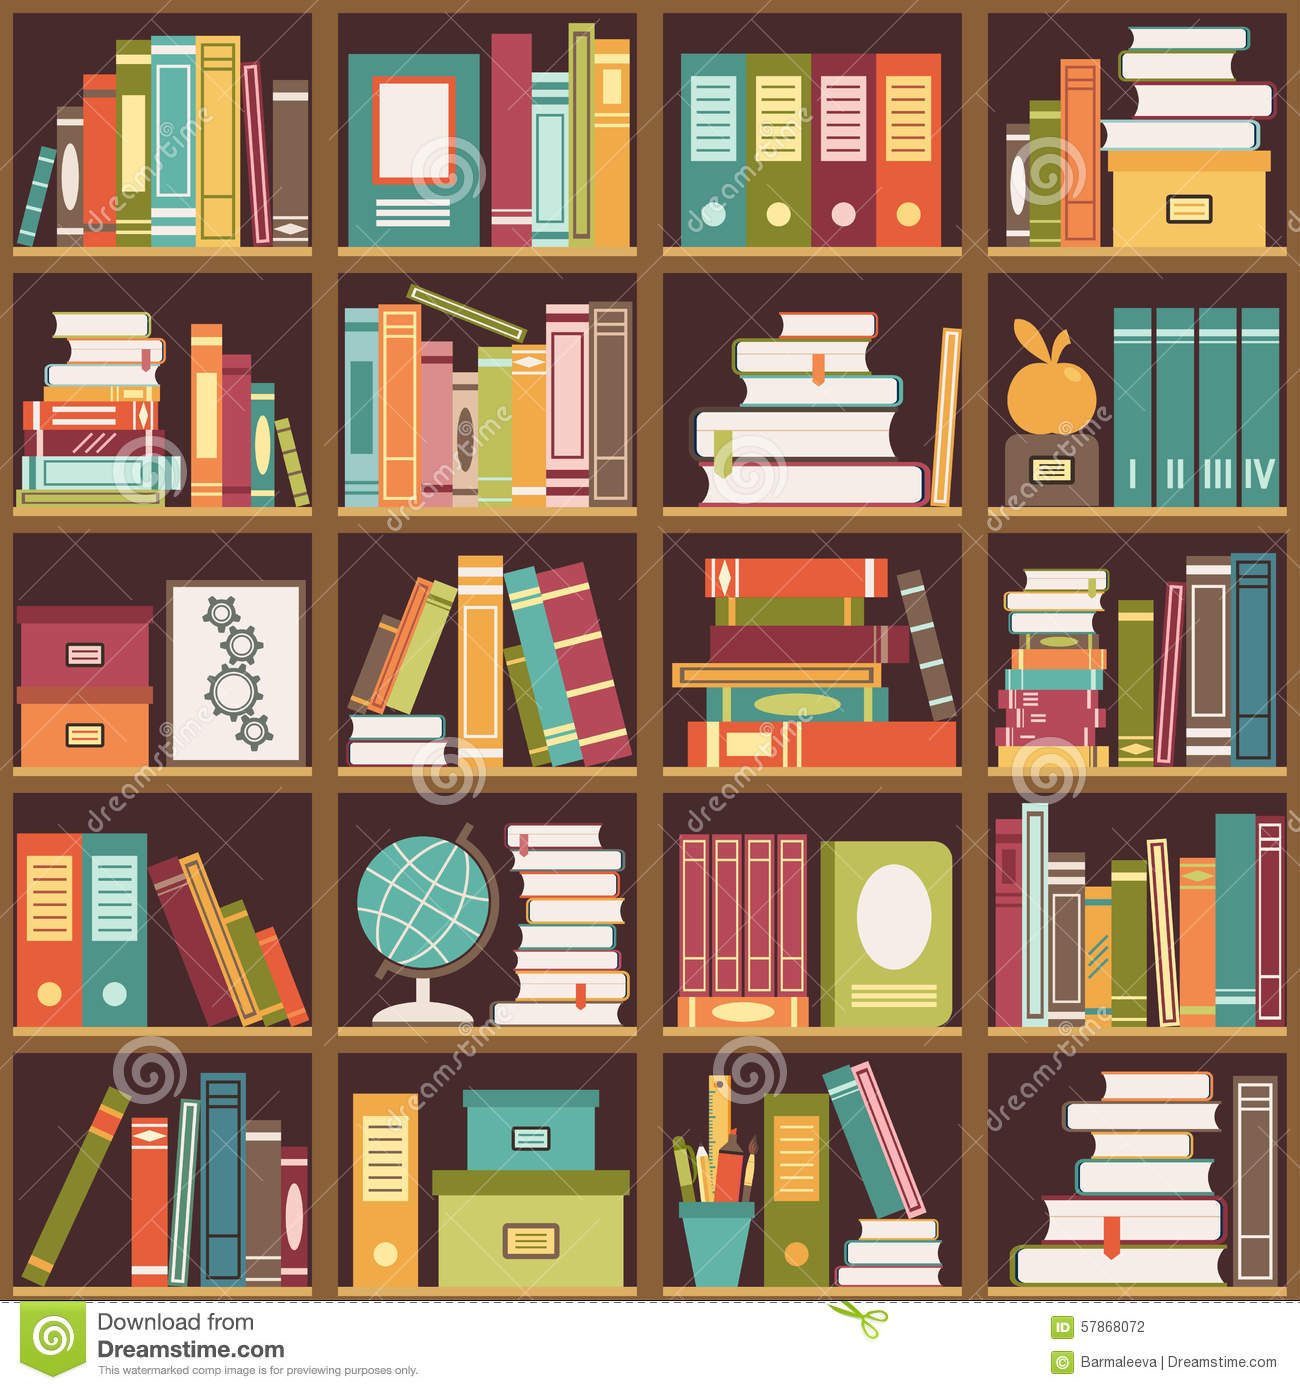 Bookshelf clipart shelving. Bookcase book background pencil